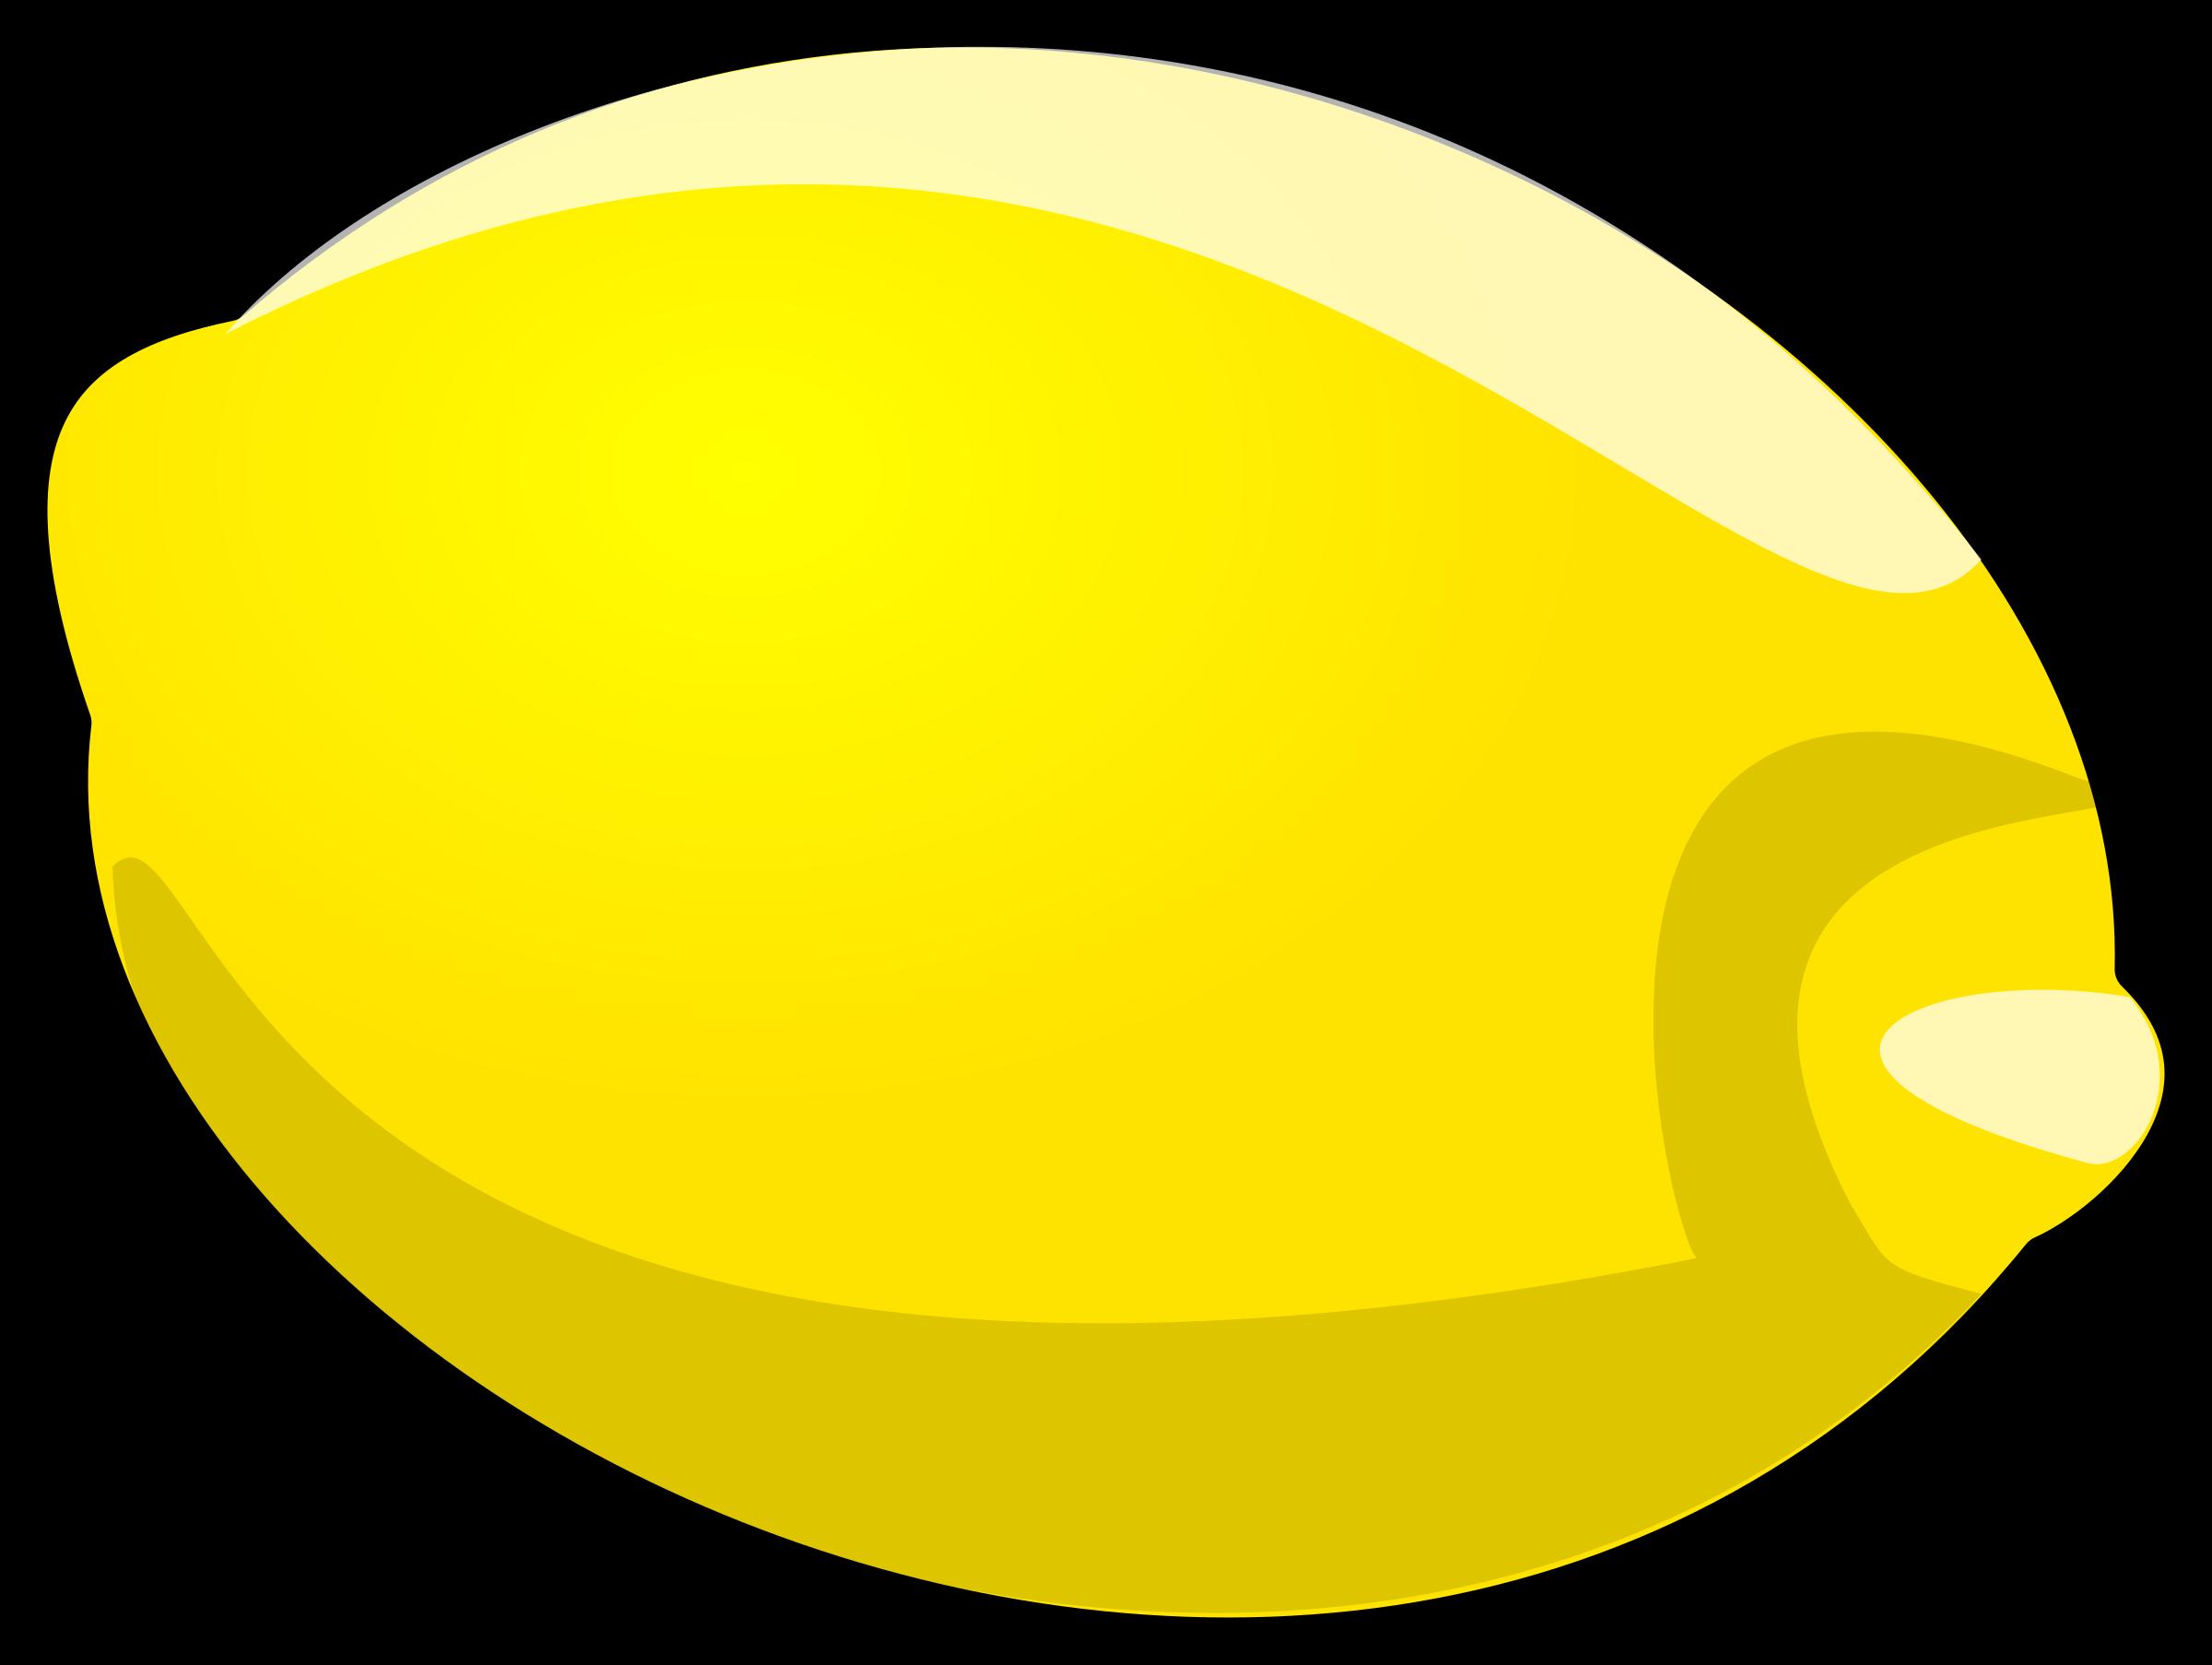 Lemon car clipart clipart royalty free Clipart - Lemon clipart royalty free